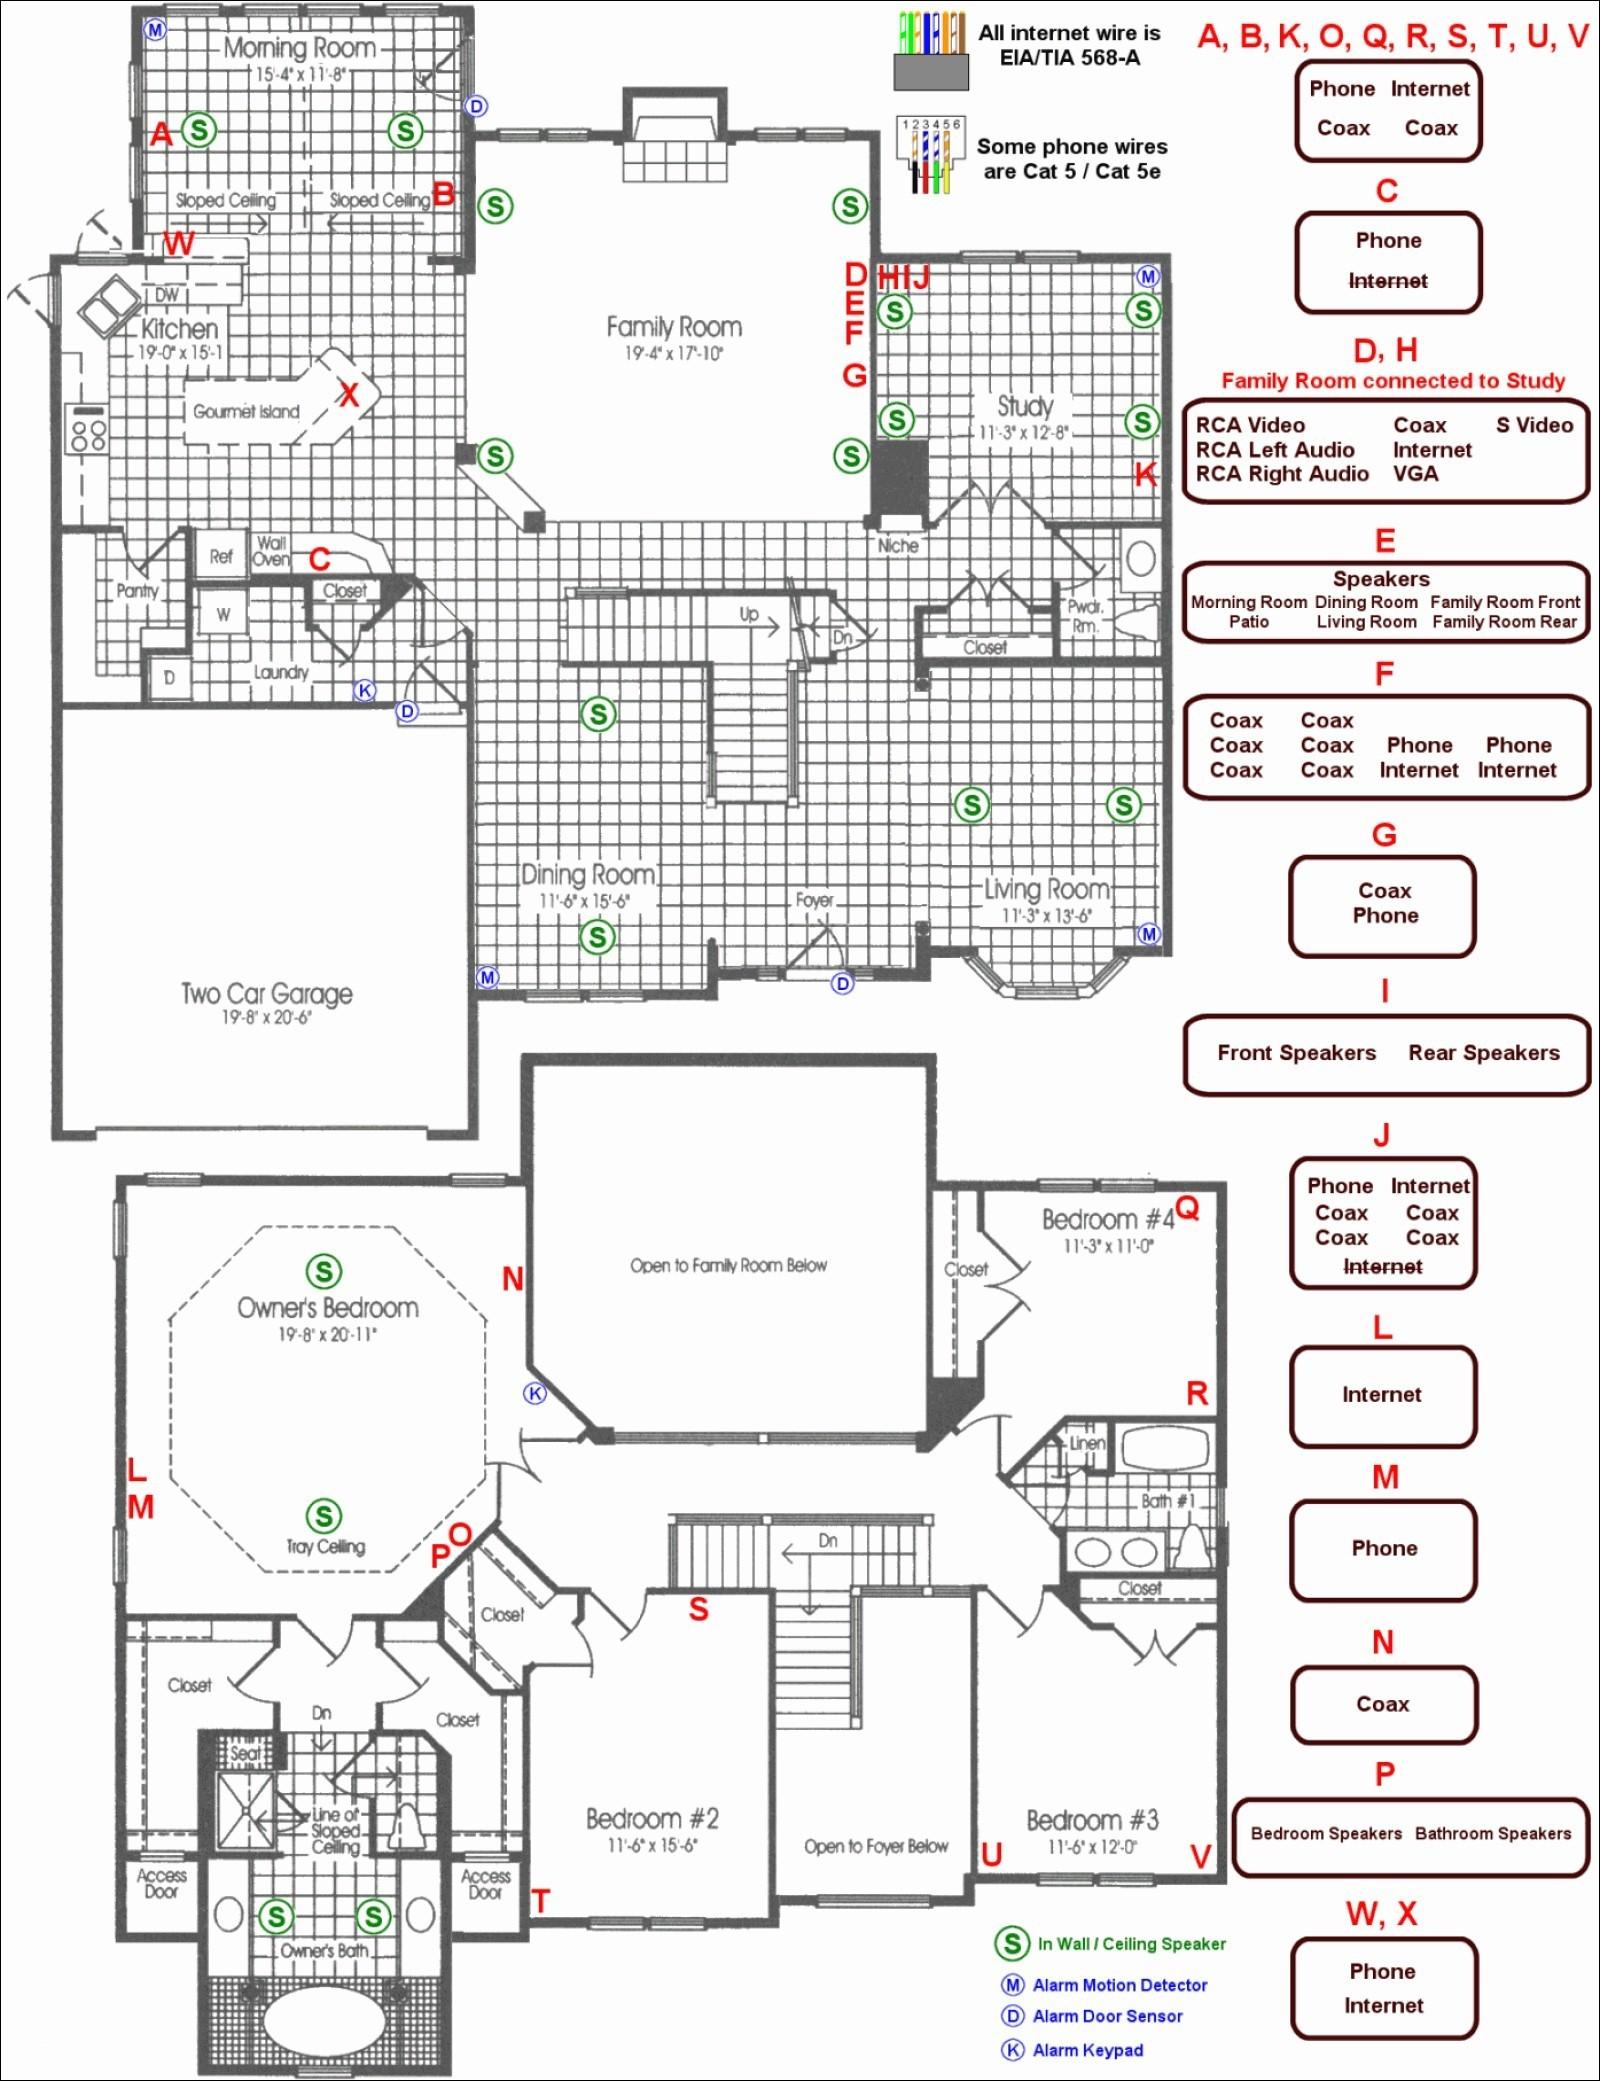 Home Electrical Wiring Diagrams Diesel Generator Control Panel Homegeneratorcontrolpanelwiringdiagramjpg Diagram For House Originalstylophone Of